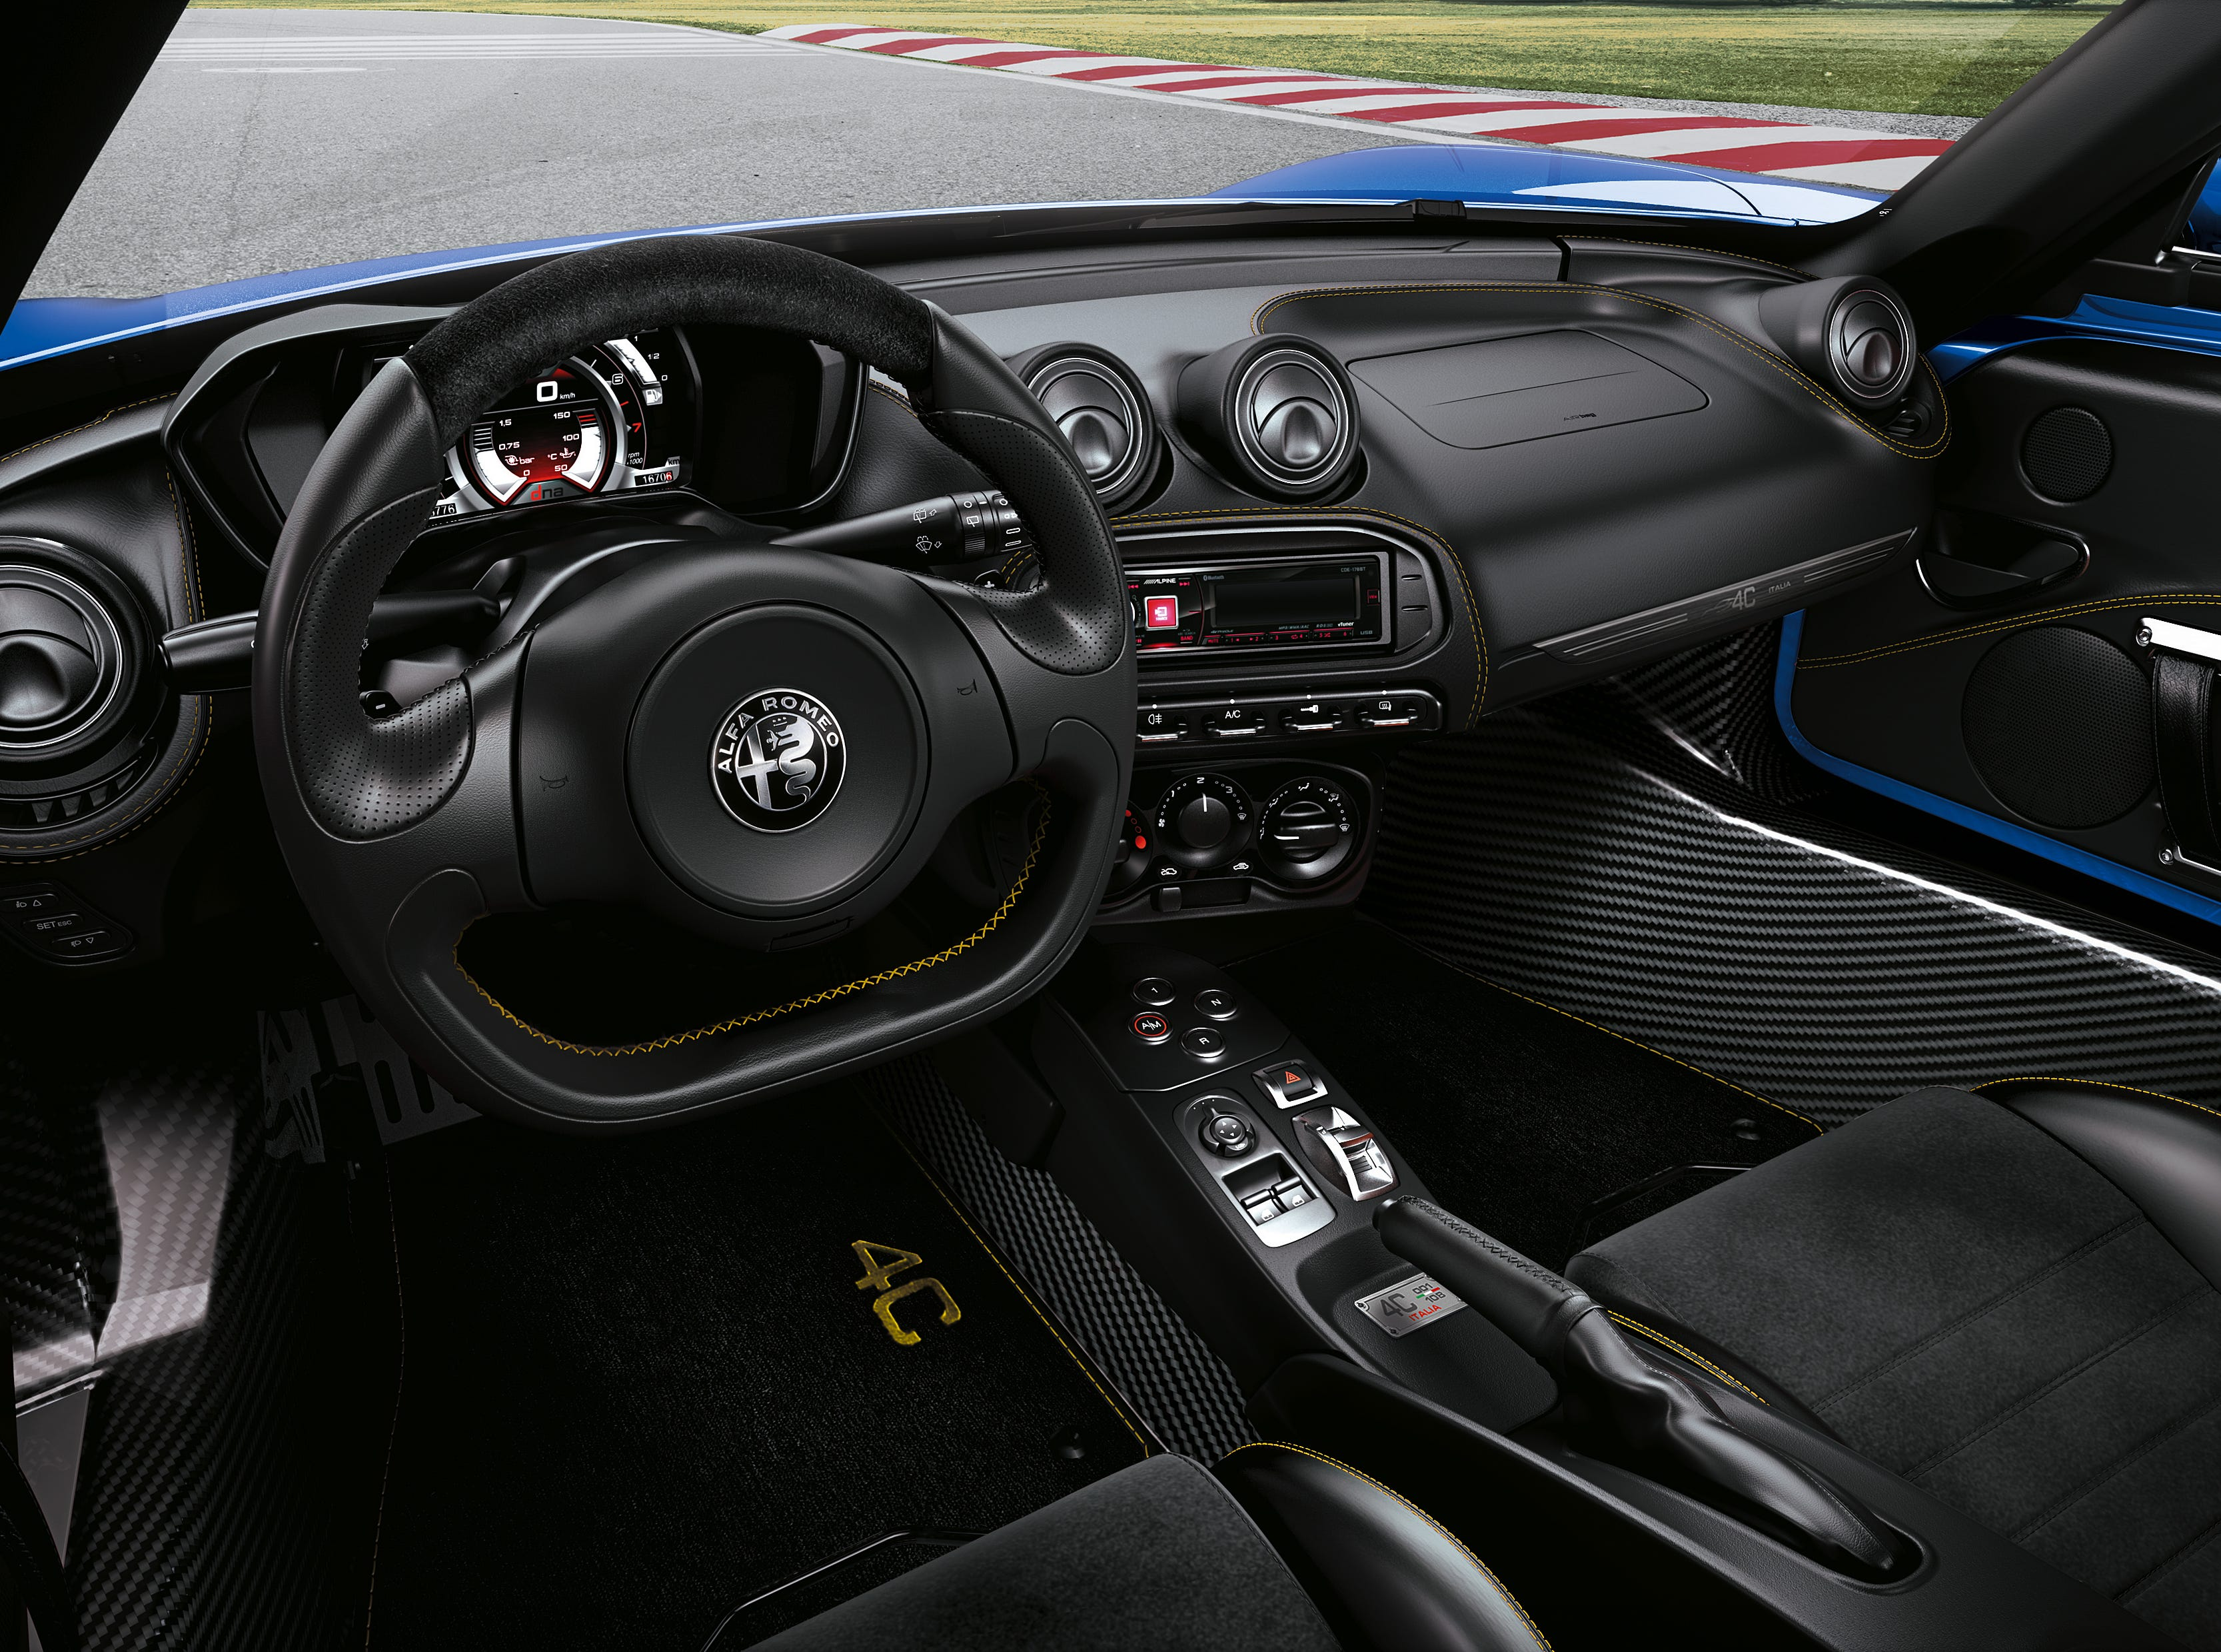 2020 Alfa Romeo 4C Spider Italia (Euro model shown)